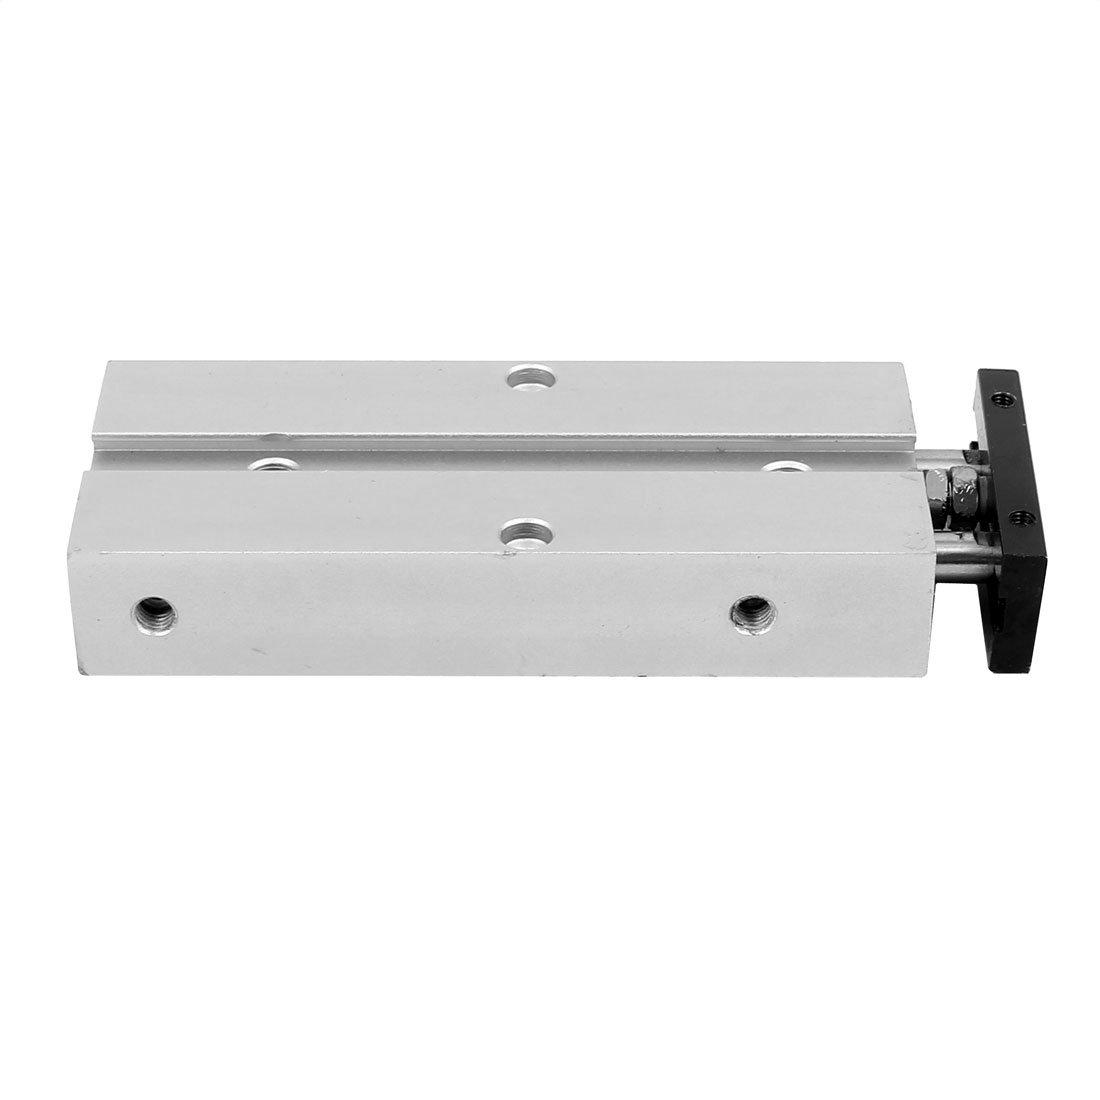 sourcing map TN10x50 Magnet Magnetisch Doppelkolbenstange Luftdruckzylinder Pneumatikzylinder DE de